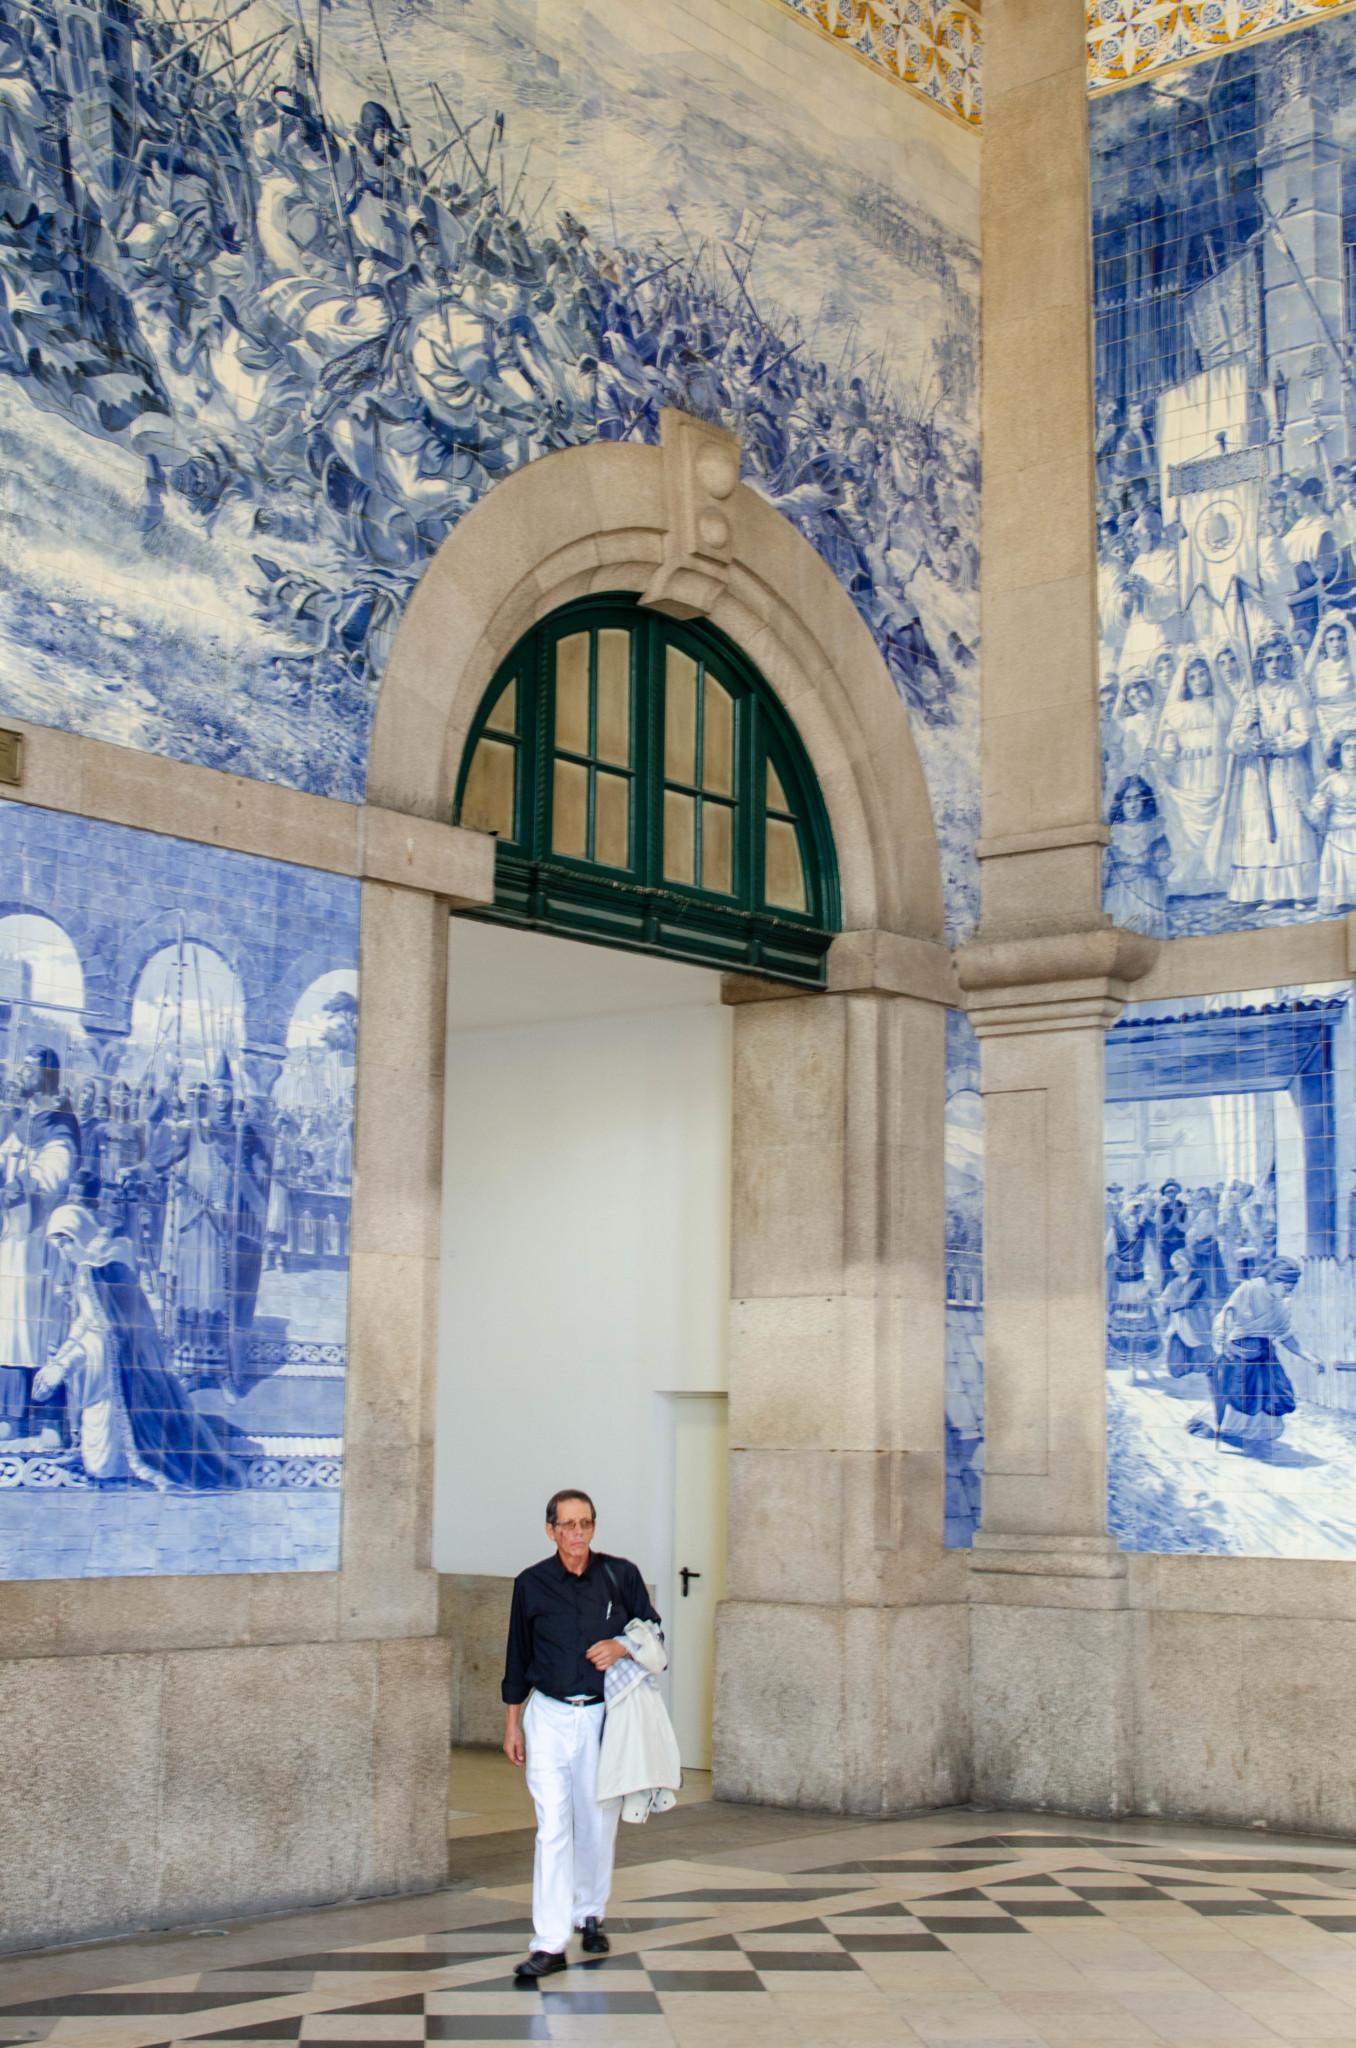 Hübscher Bahnhof Sao Bento in Porto in Portugal